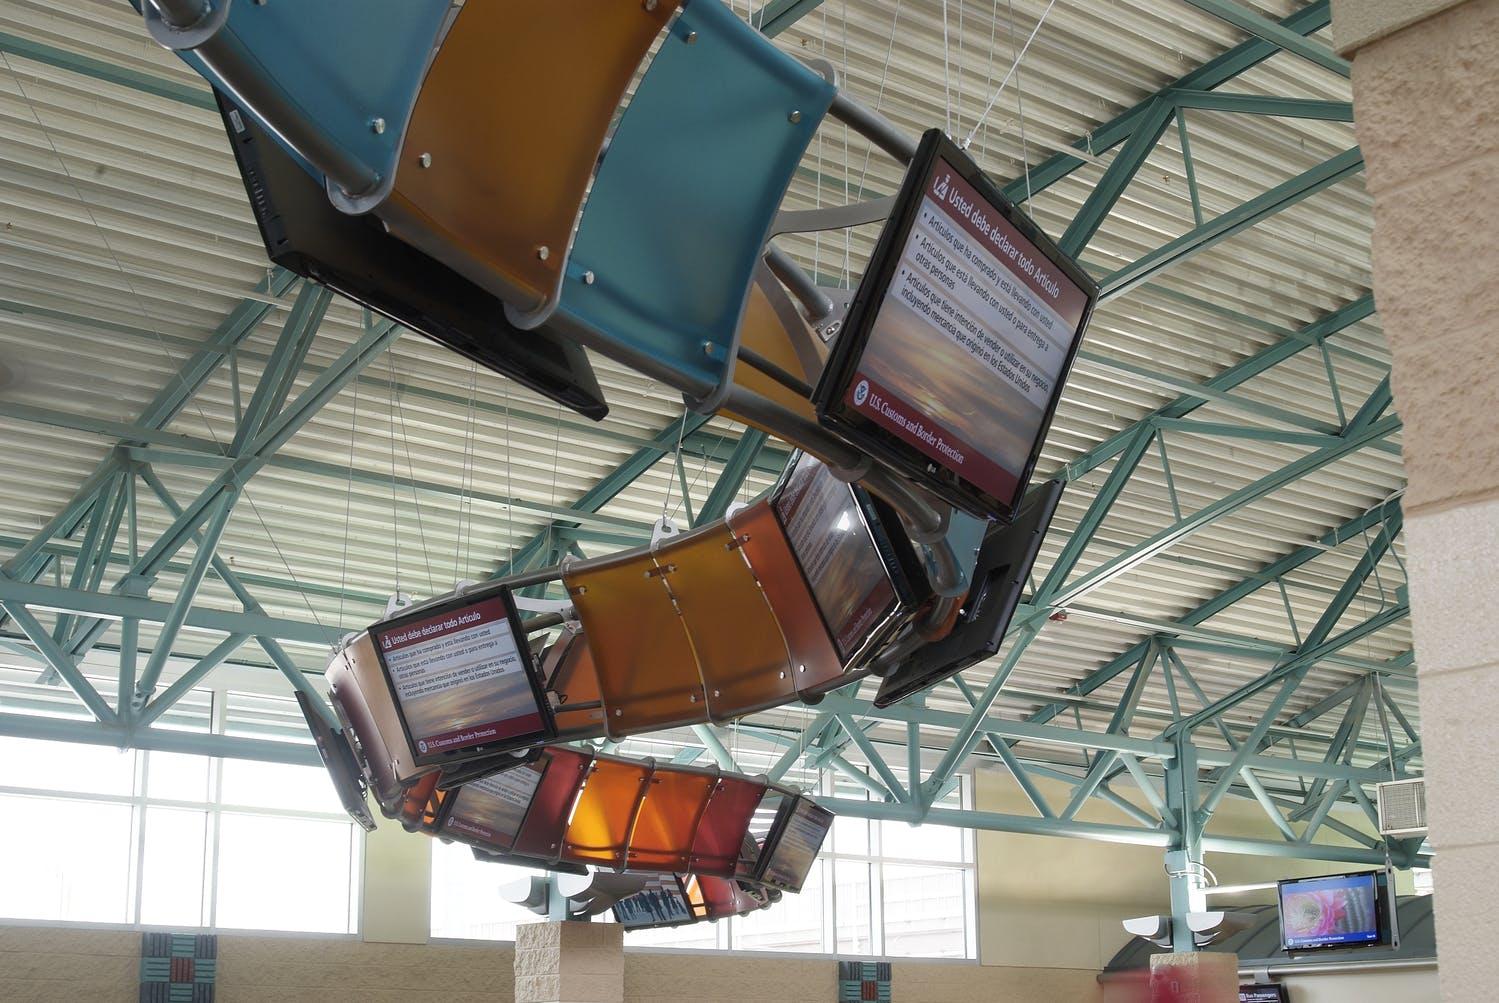 Paso Del Norte Reengineering Gallery Images